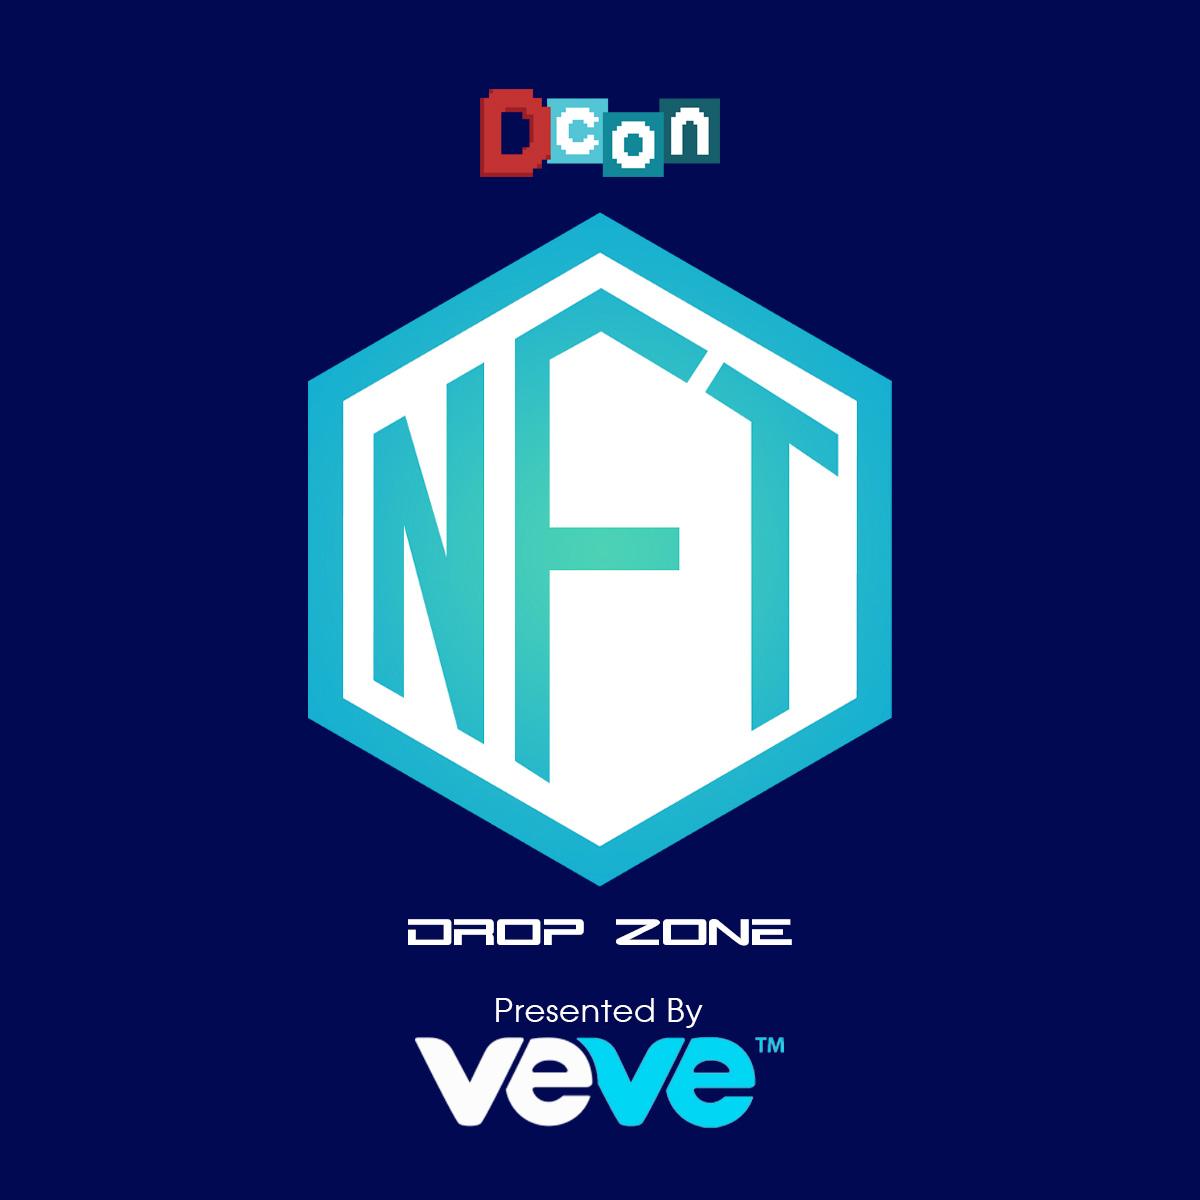 http://www.designercon.com/wp-content/uploads/2021/08/2021_nftzone.jpg